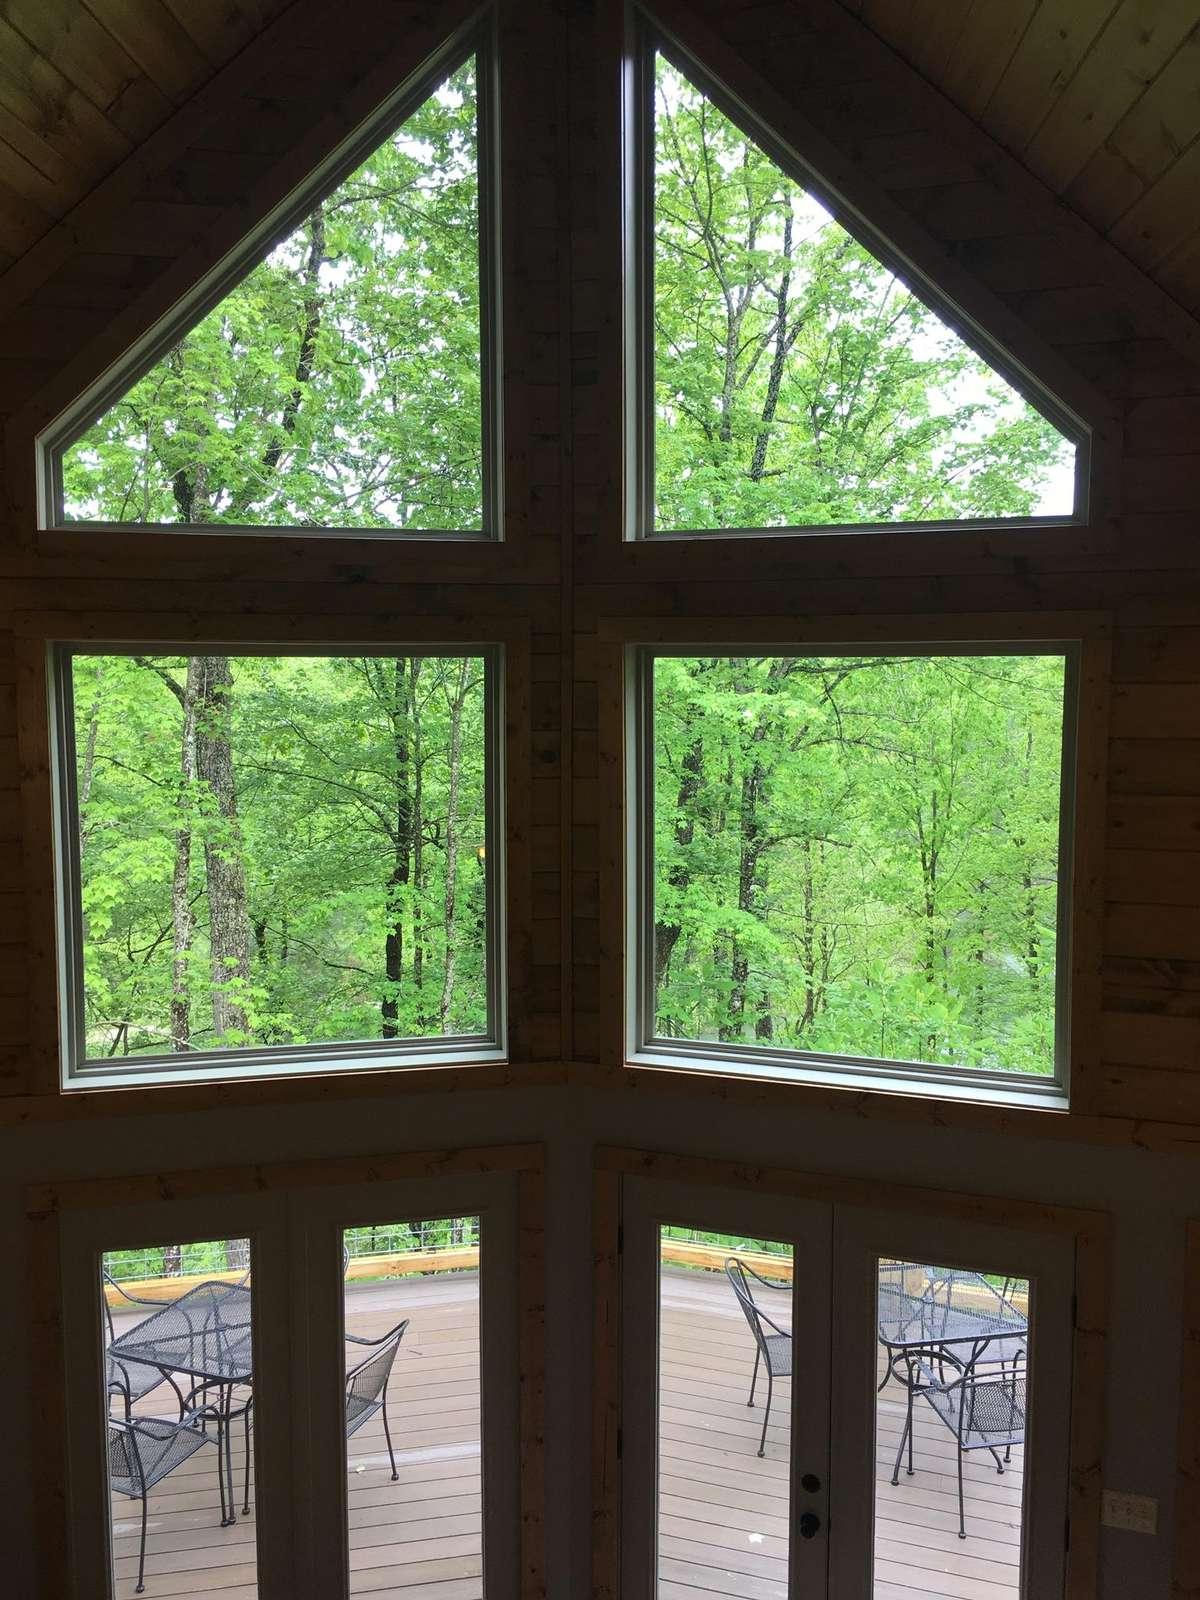 Kentucky Straight Wilderness_ View from Second Floor